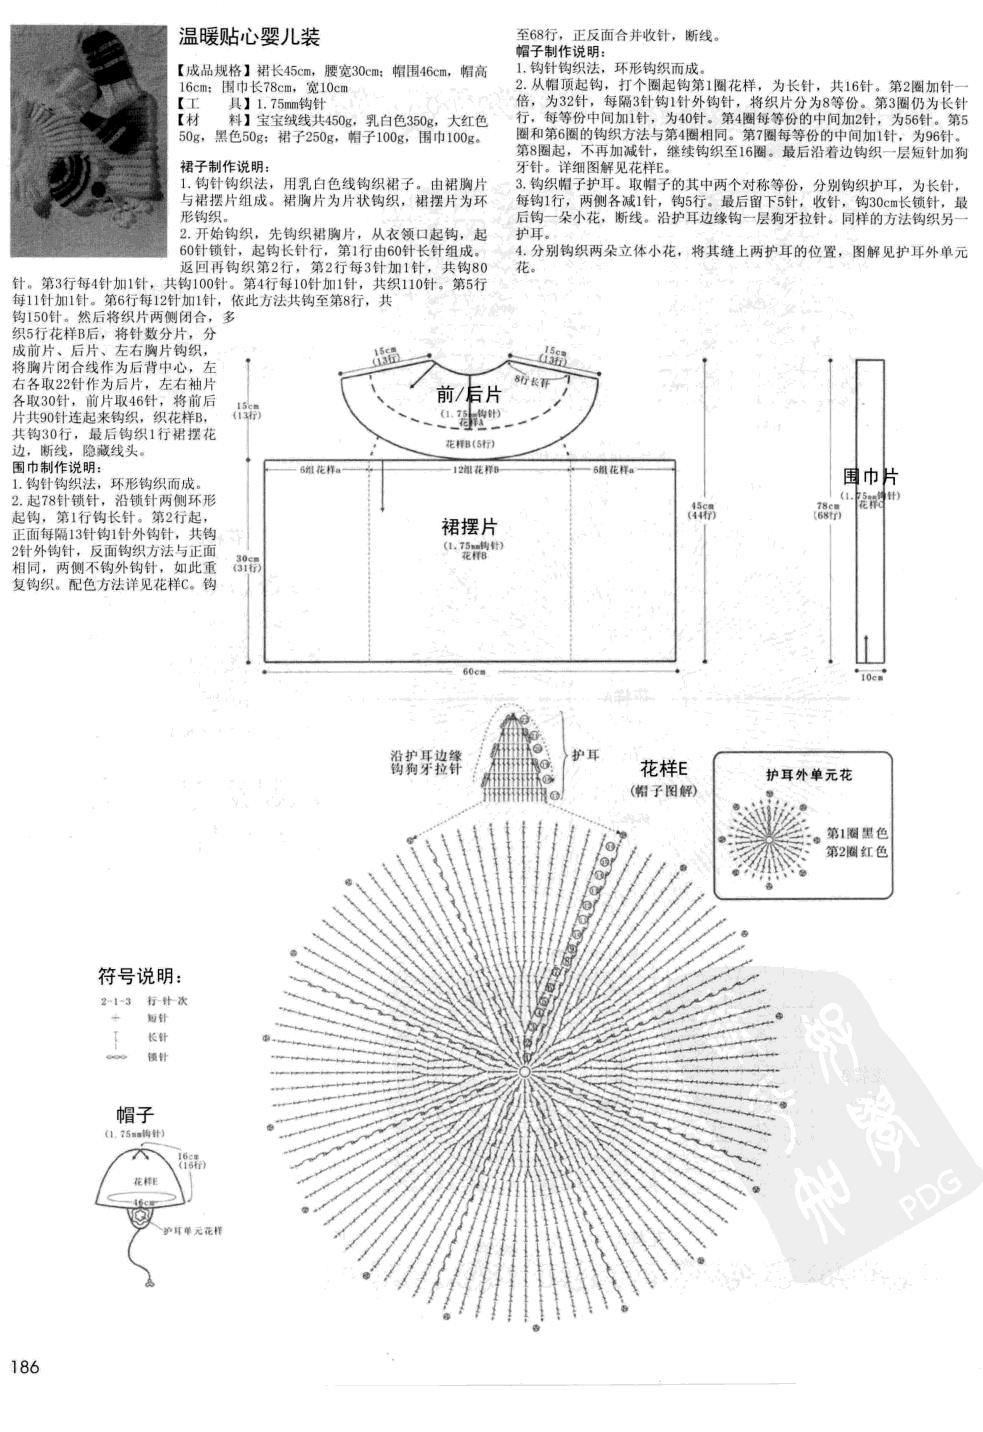 p (186).jpg